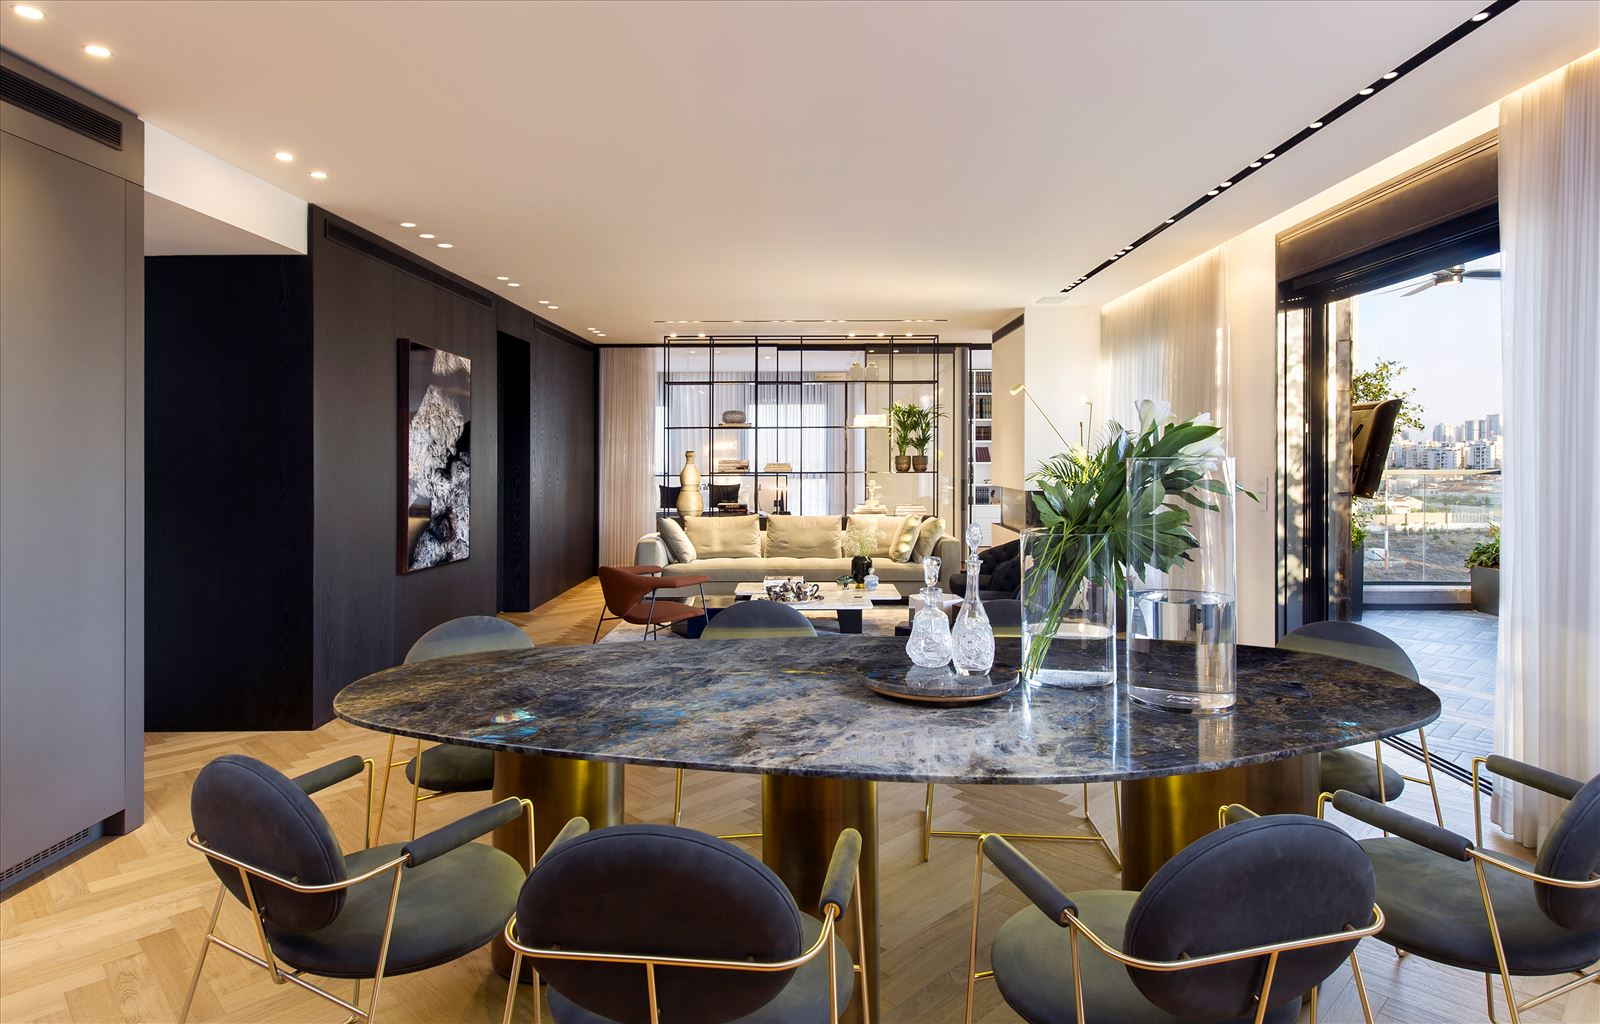 Penthouse - Petah Tikva מרחב הדירה בעיצוב מיוחד של גופי תאורה נעשה על ידי דורי קמחי